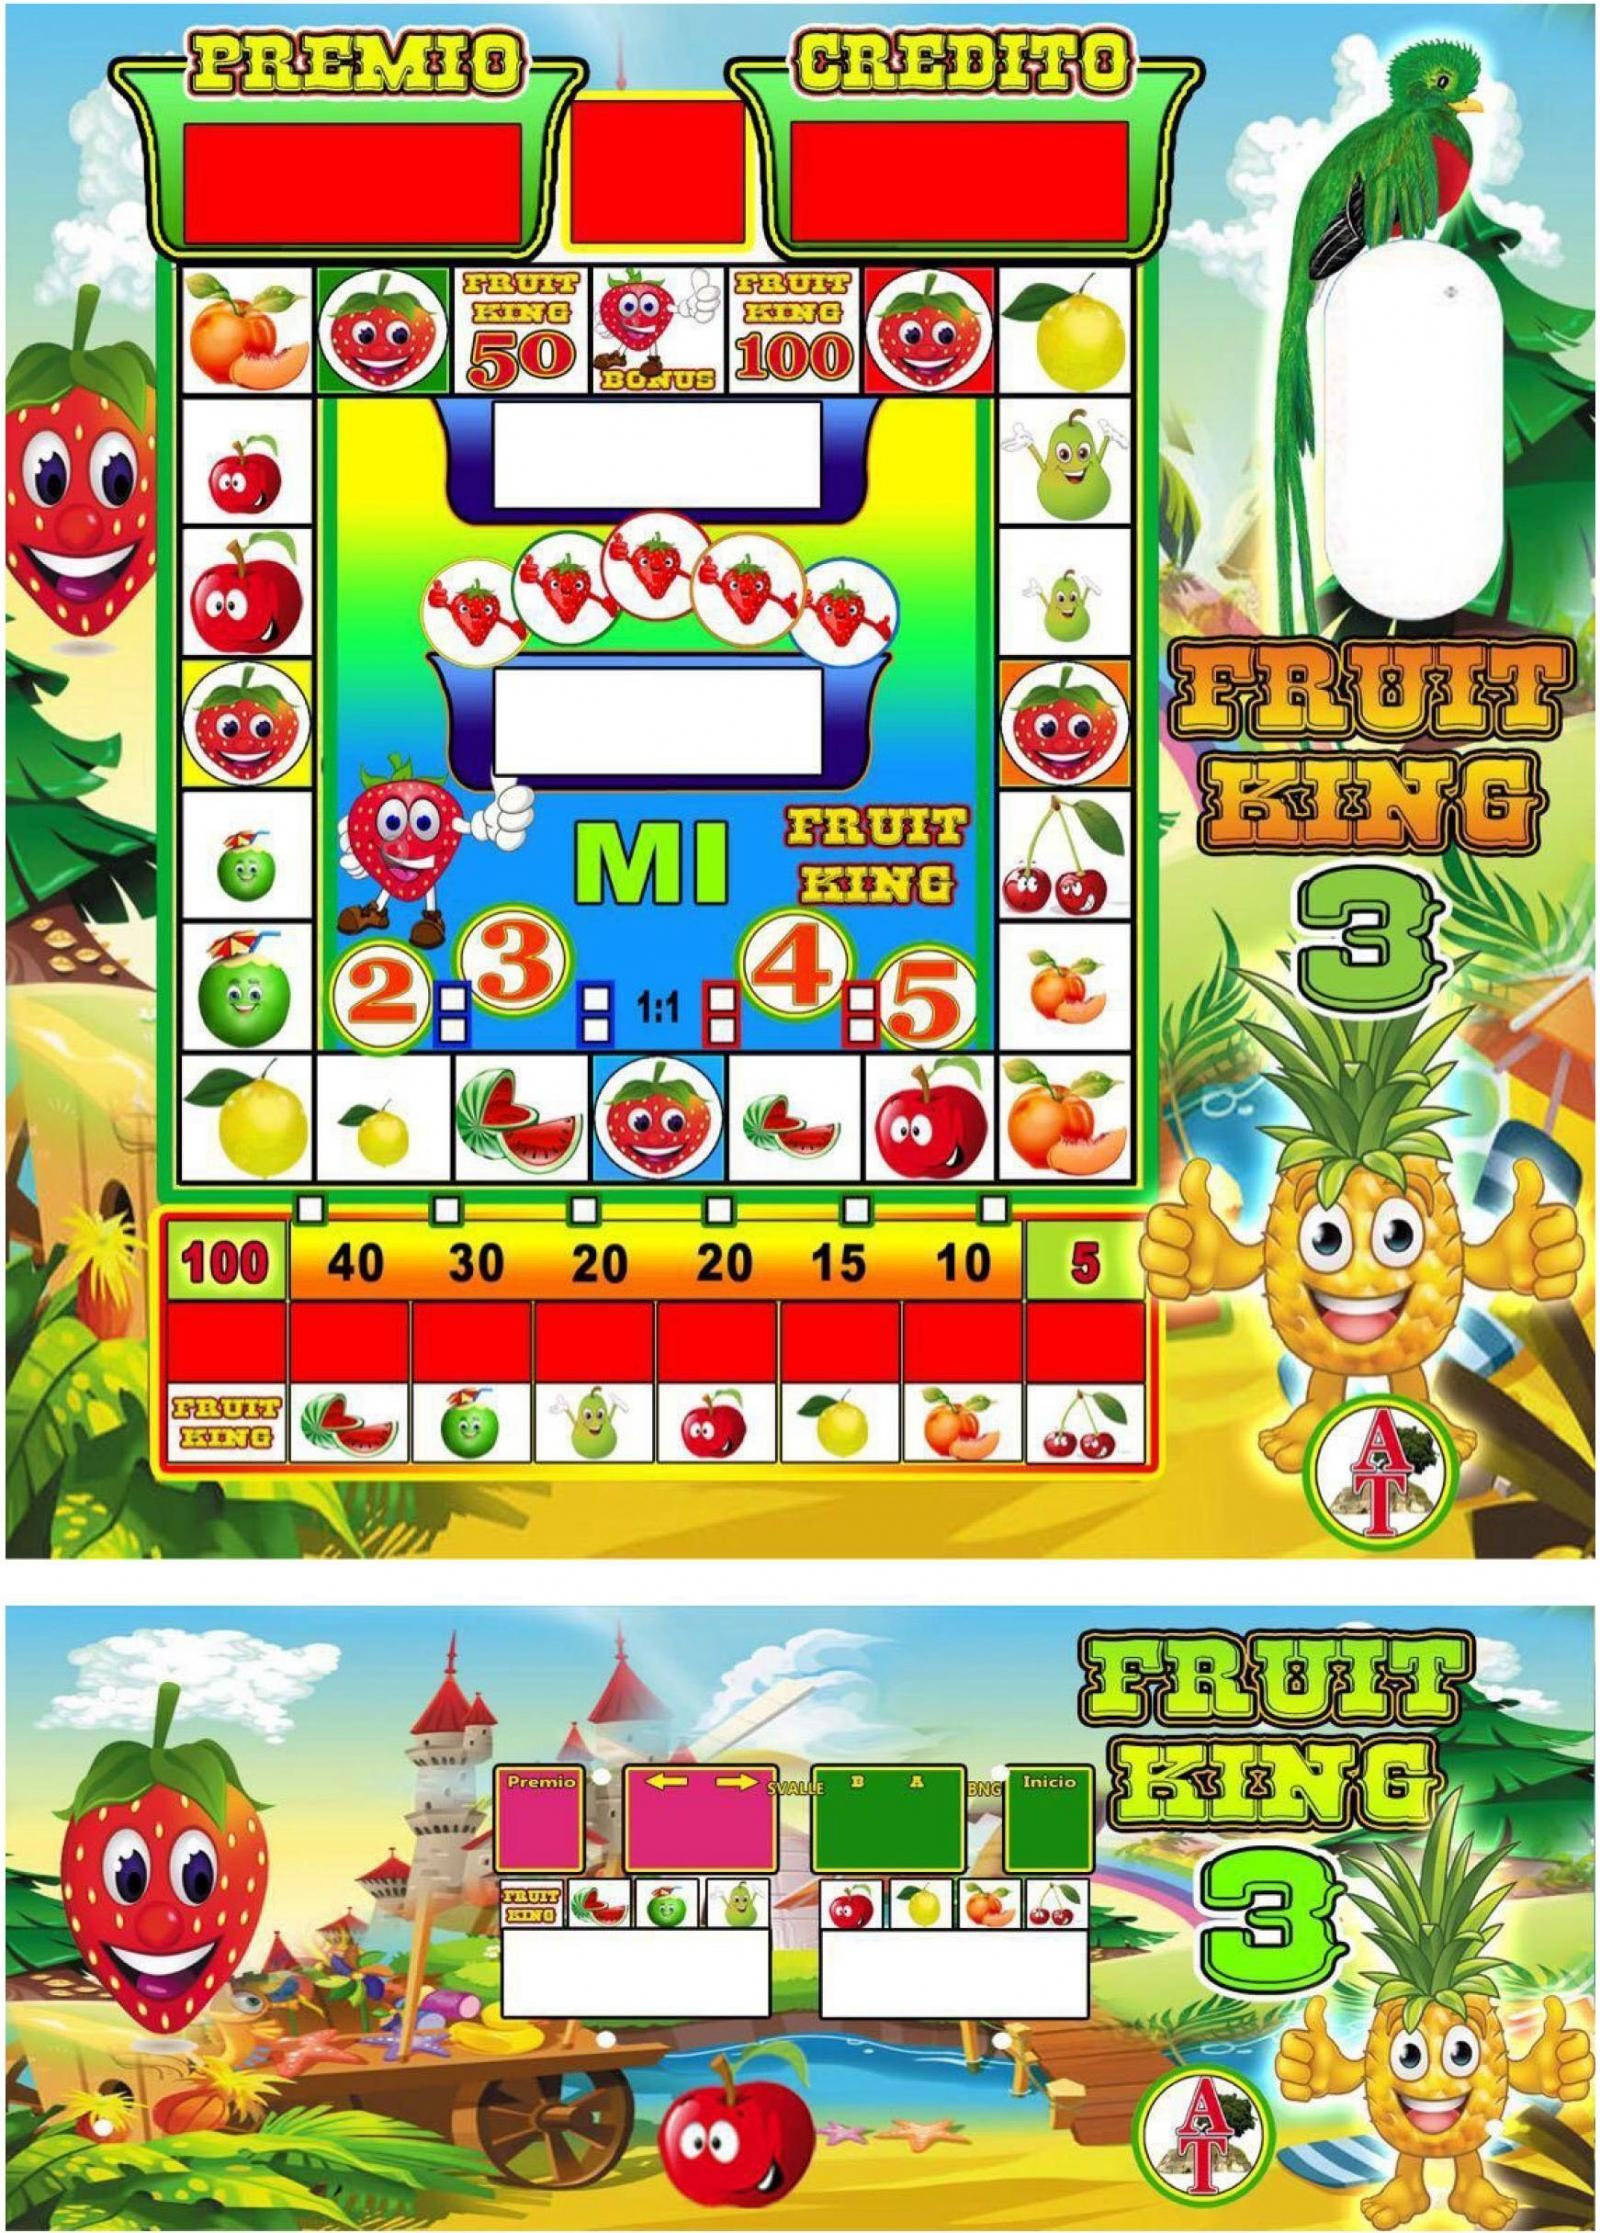 Netent mobile games